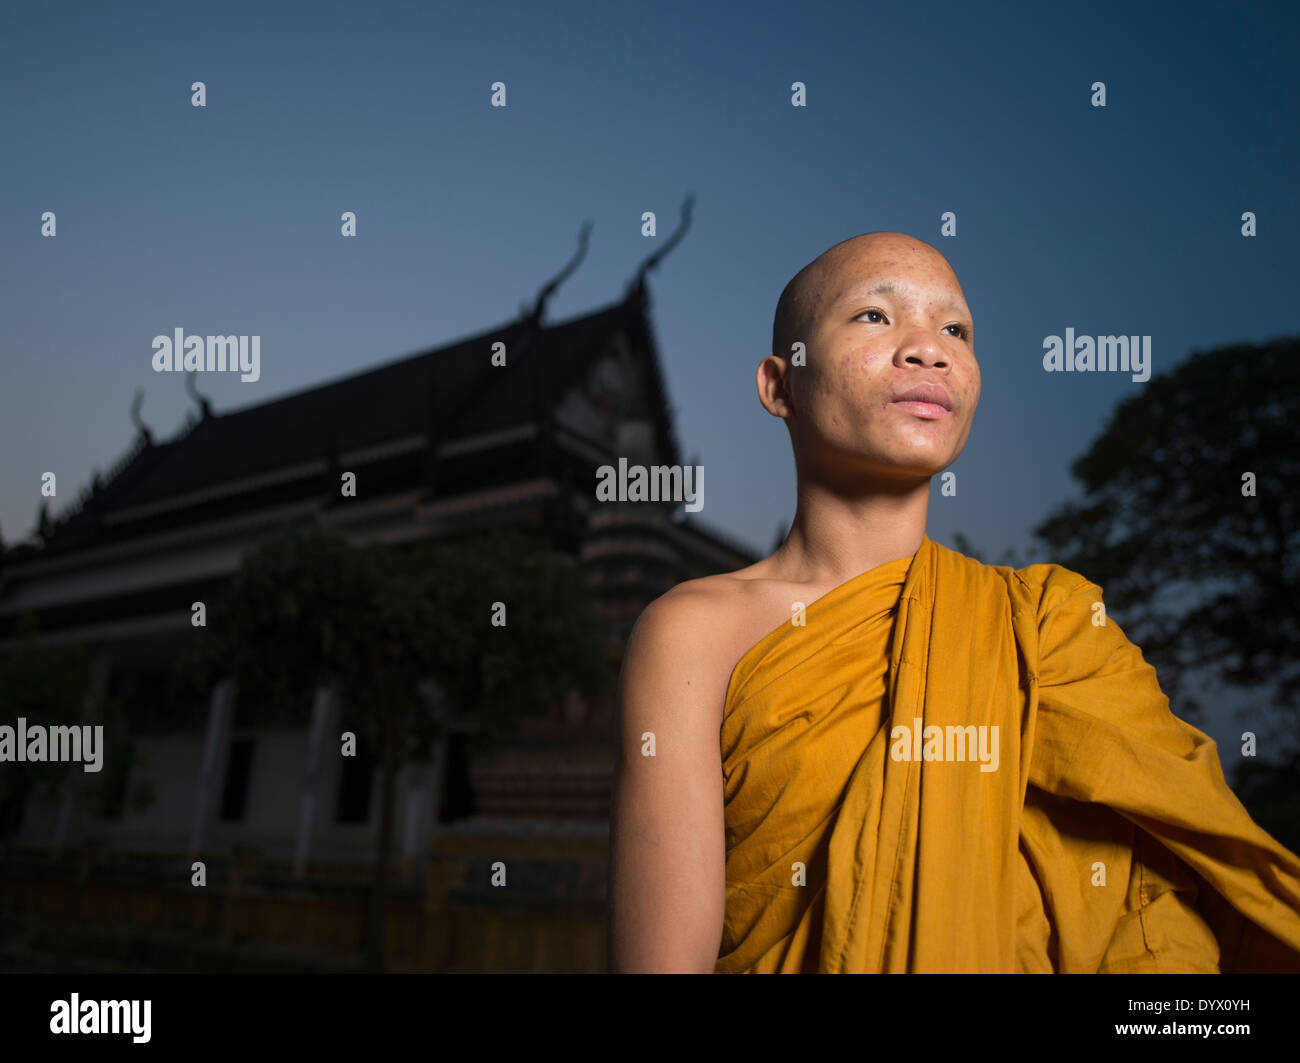 Kambodschanische buddhistischer Mönch im Tempel Angkor Wat in der Morgendämmerung, Siem Reap, Kambodscha Stockbild